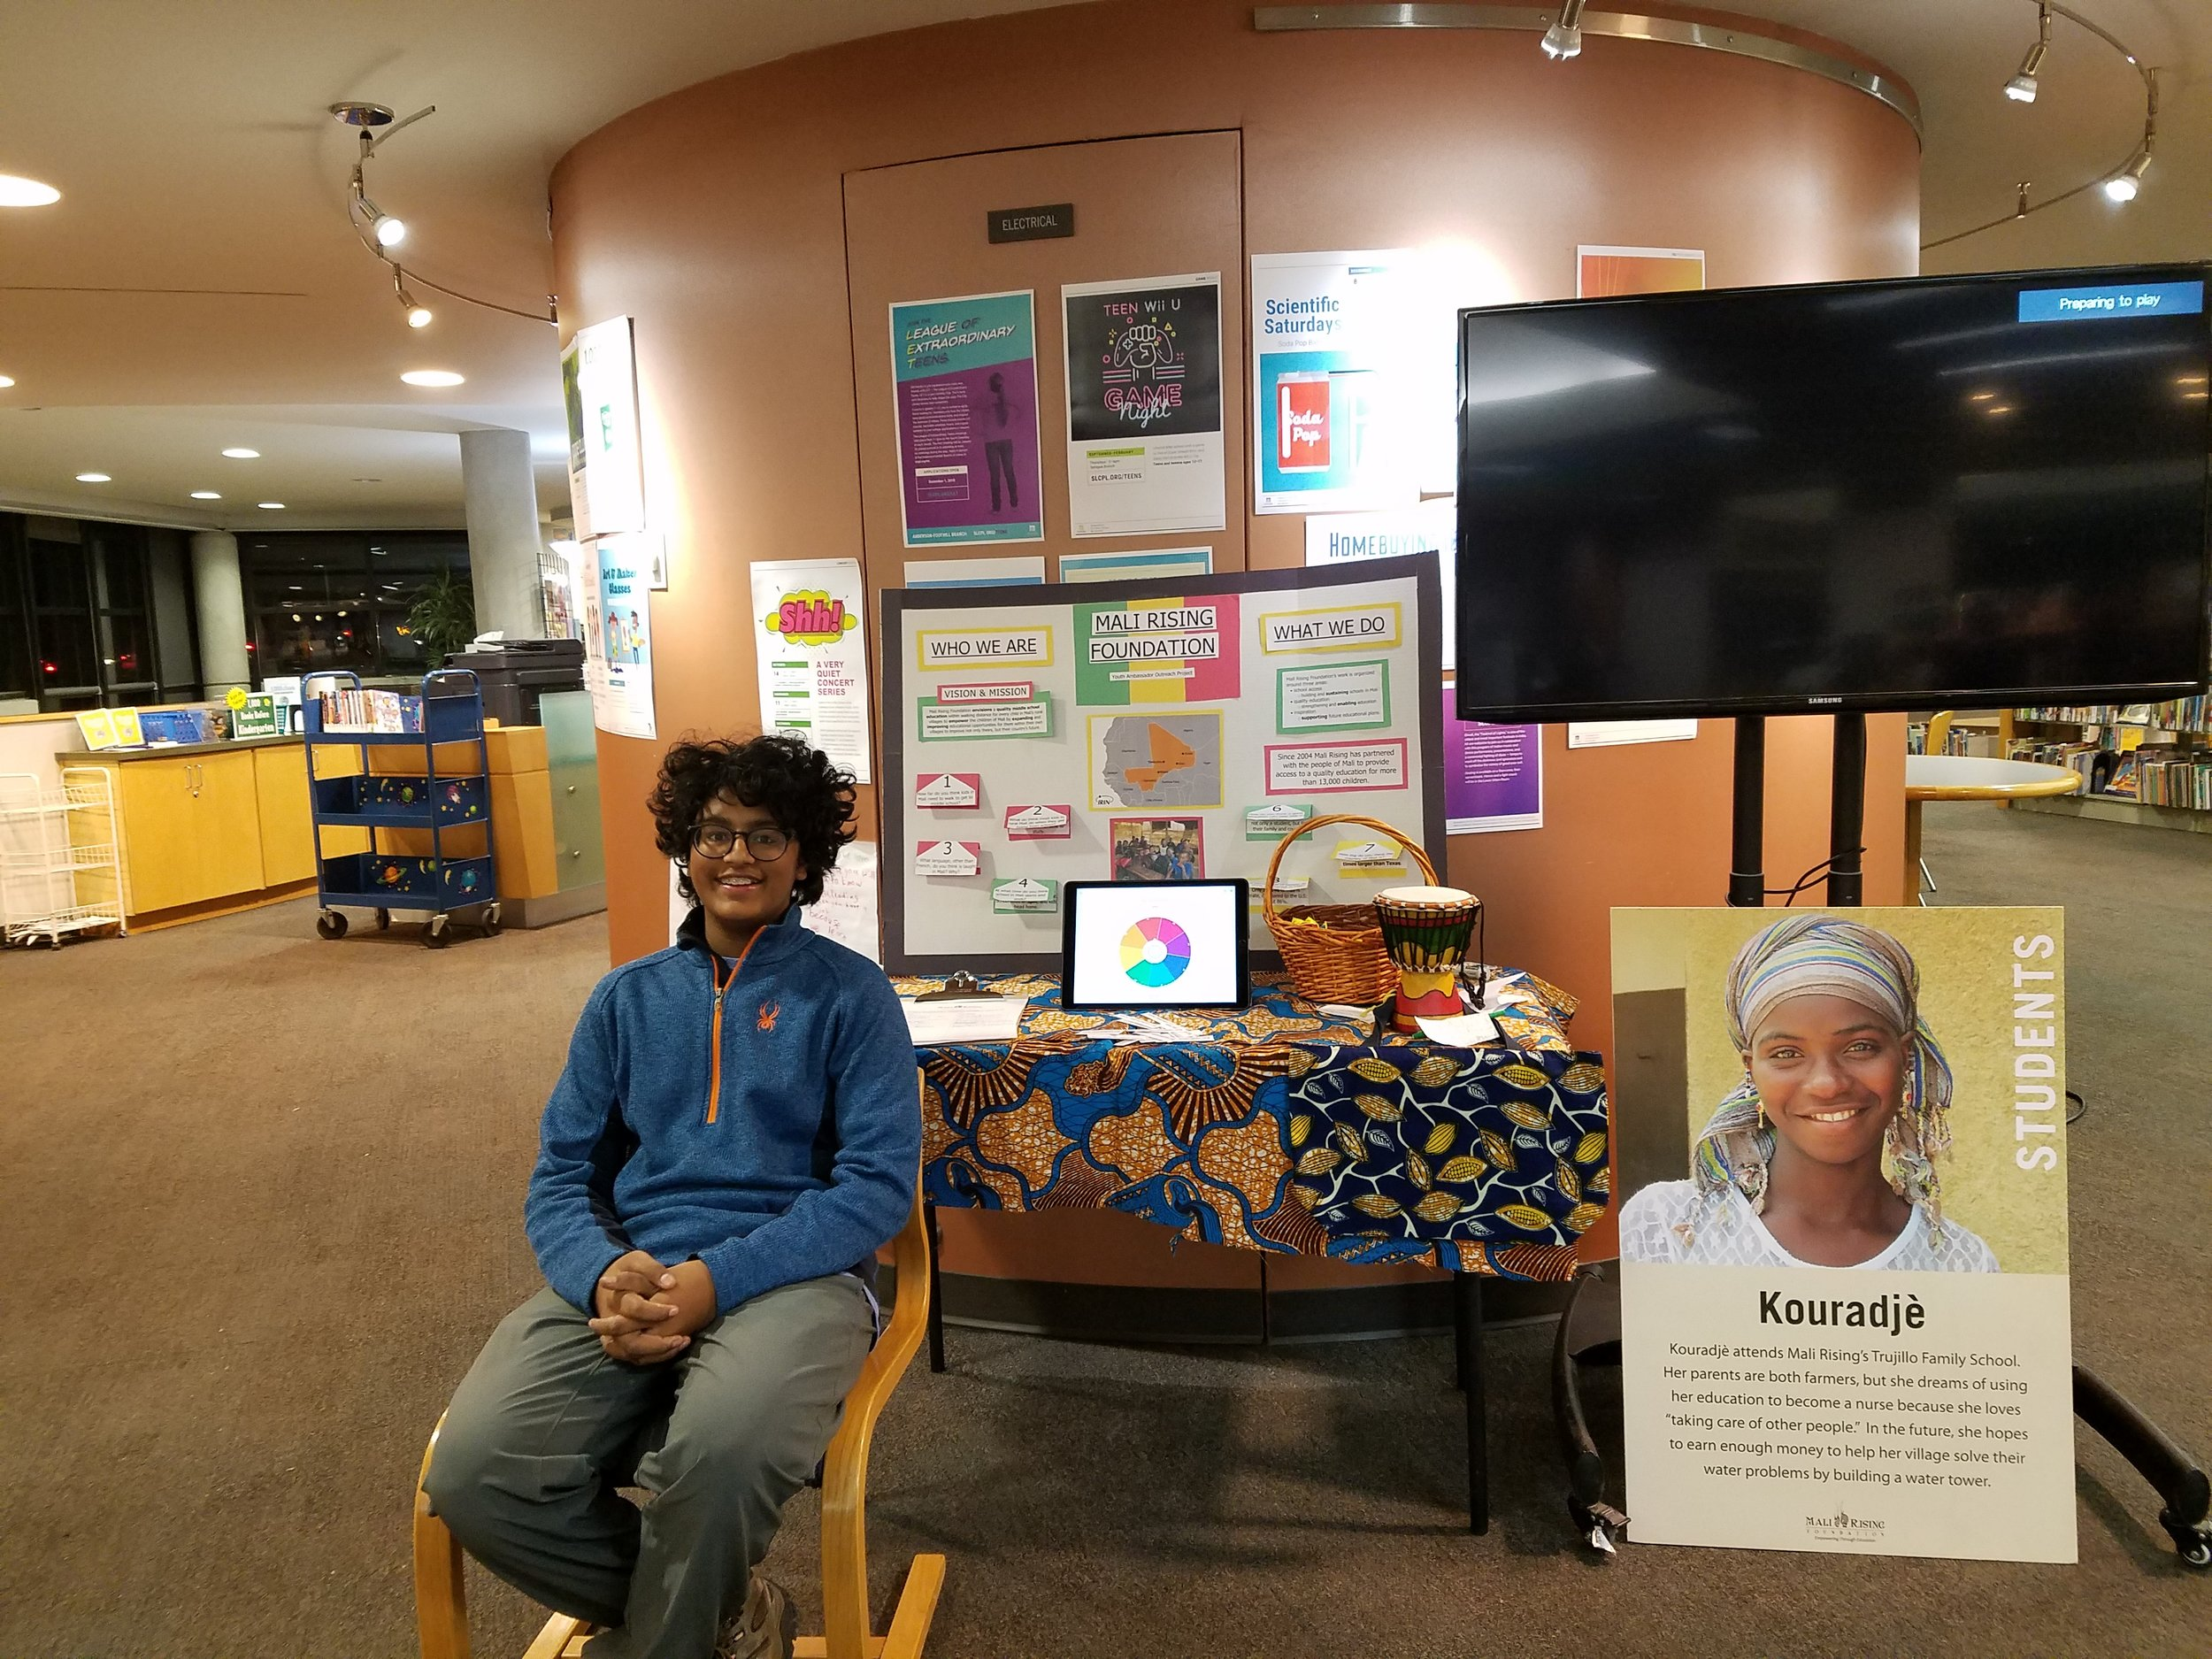 Vishal and his awesome library display!